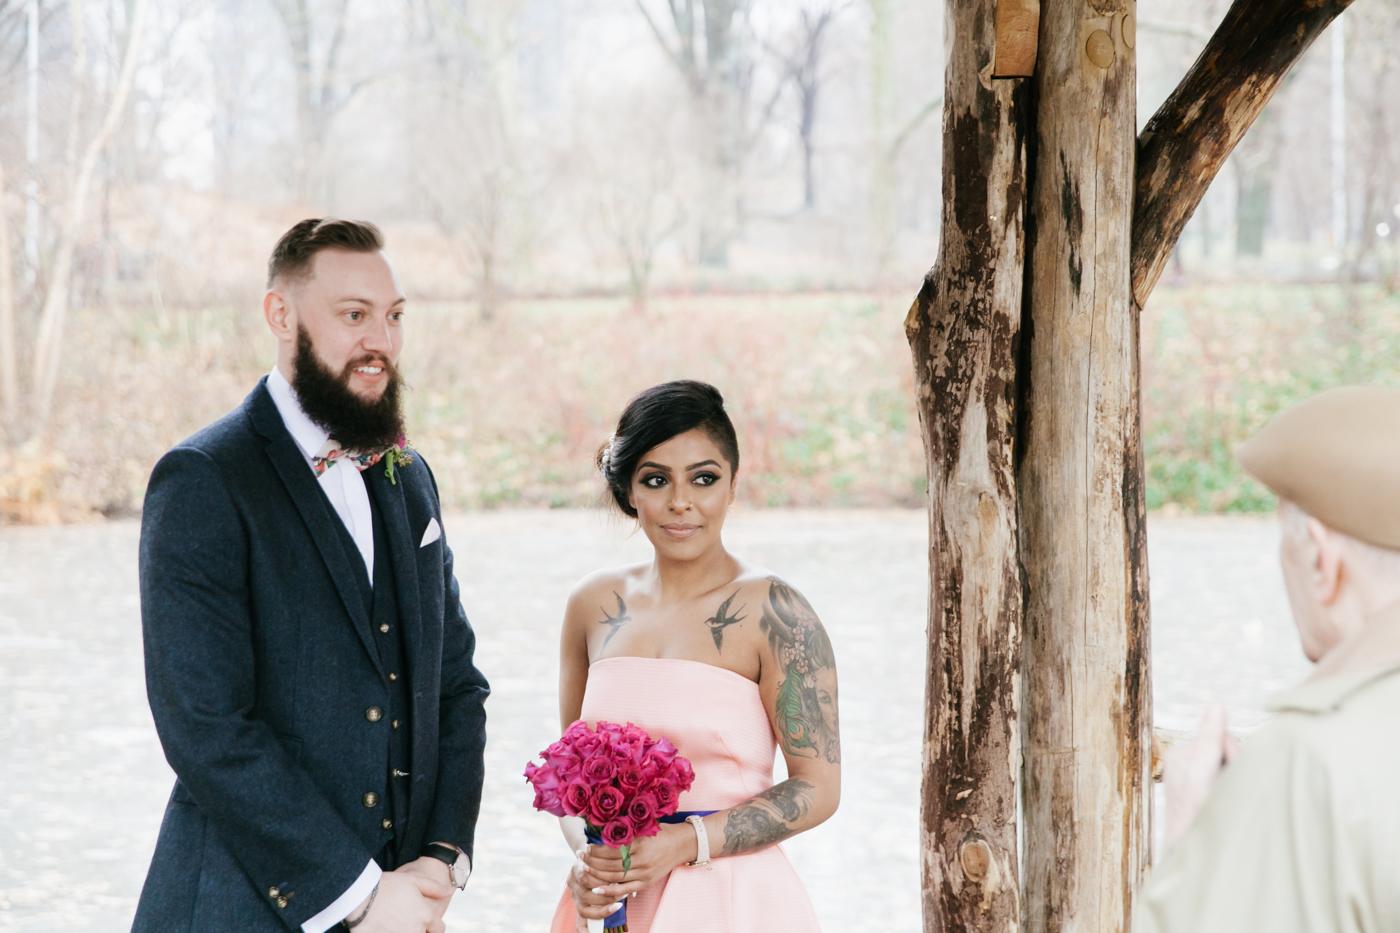 Central-park-wedding-by-Tanya-Isaeva-31.jpg